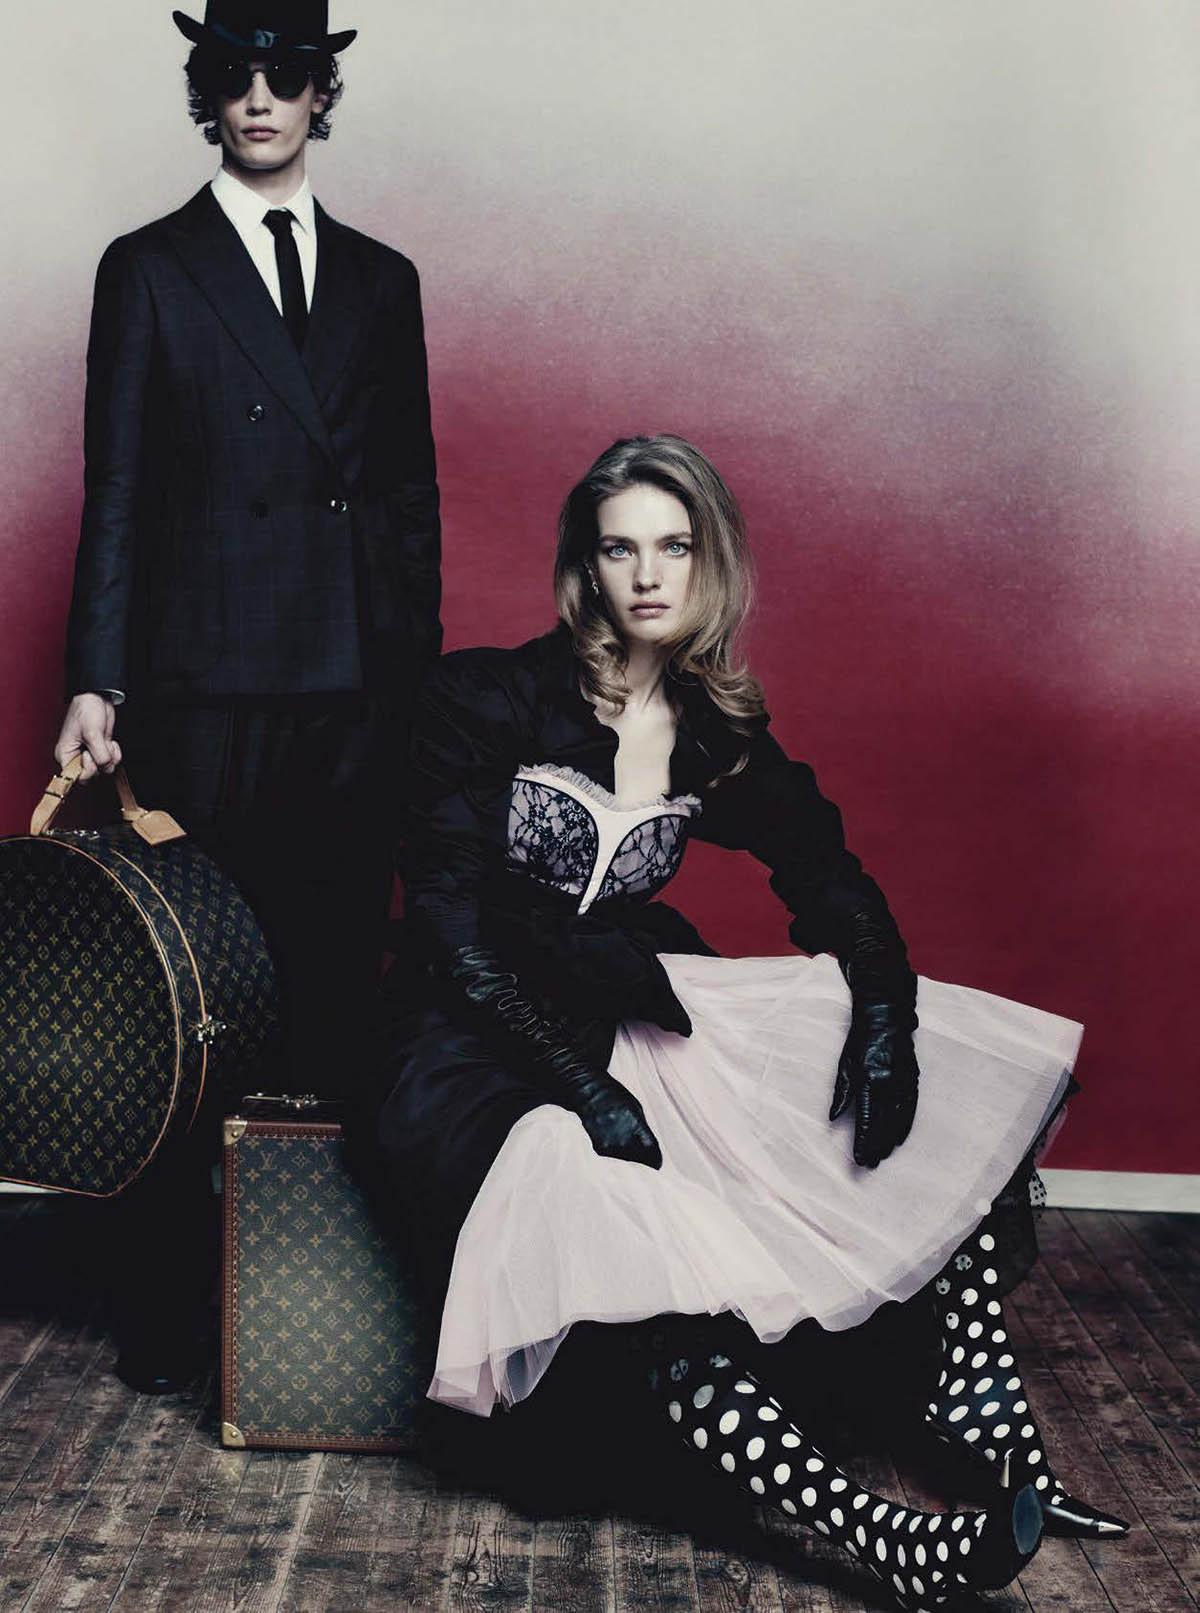 Natalia Vodianova covers Vogue Italia April 2021 by Paolo Roversi